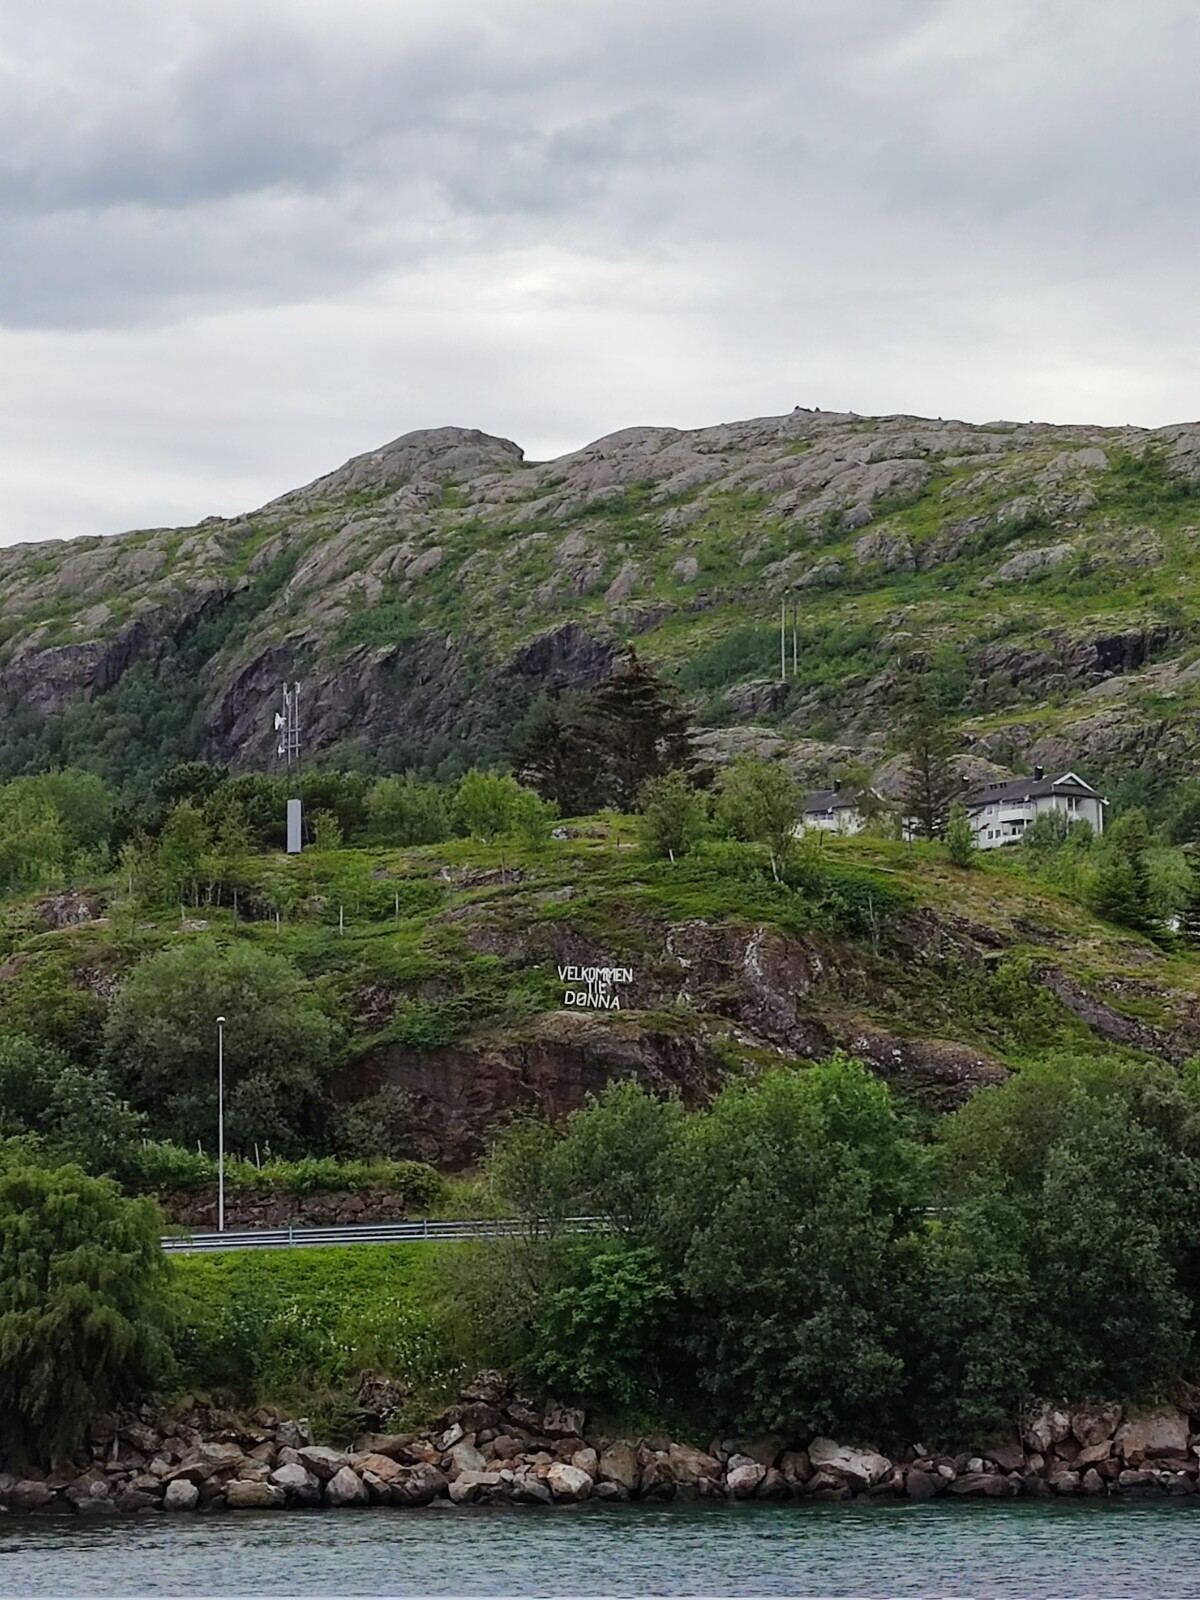 bildedryss-bilder-nordnorge-nord-norge-seløy-seløya-helgeland-herøy-sandnessjøen-mosjøen-natur-norge-norway-northofnorway-trondheim-vakkernatur-isalicious-klartvann-strang-norgesommer-norgessommer-sommer-helgelandskysten